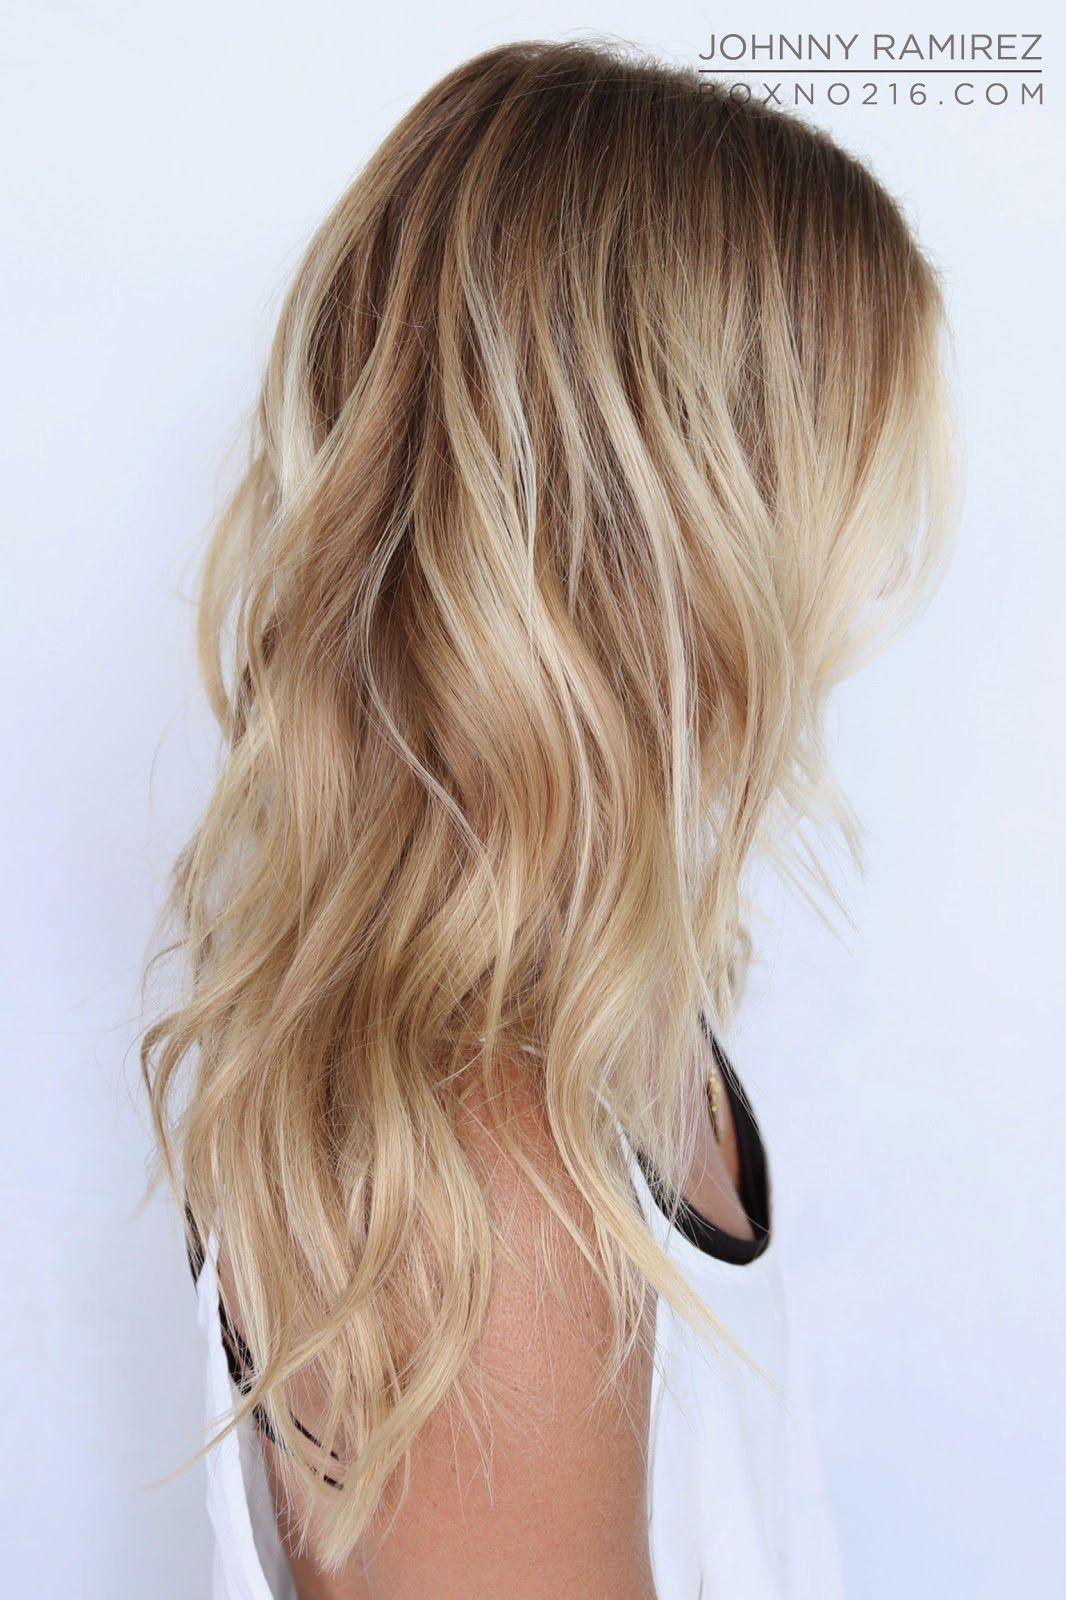 Warm Blonde Hair Styles In 2018 Pinterest Hair Blonde Hair